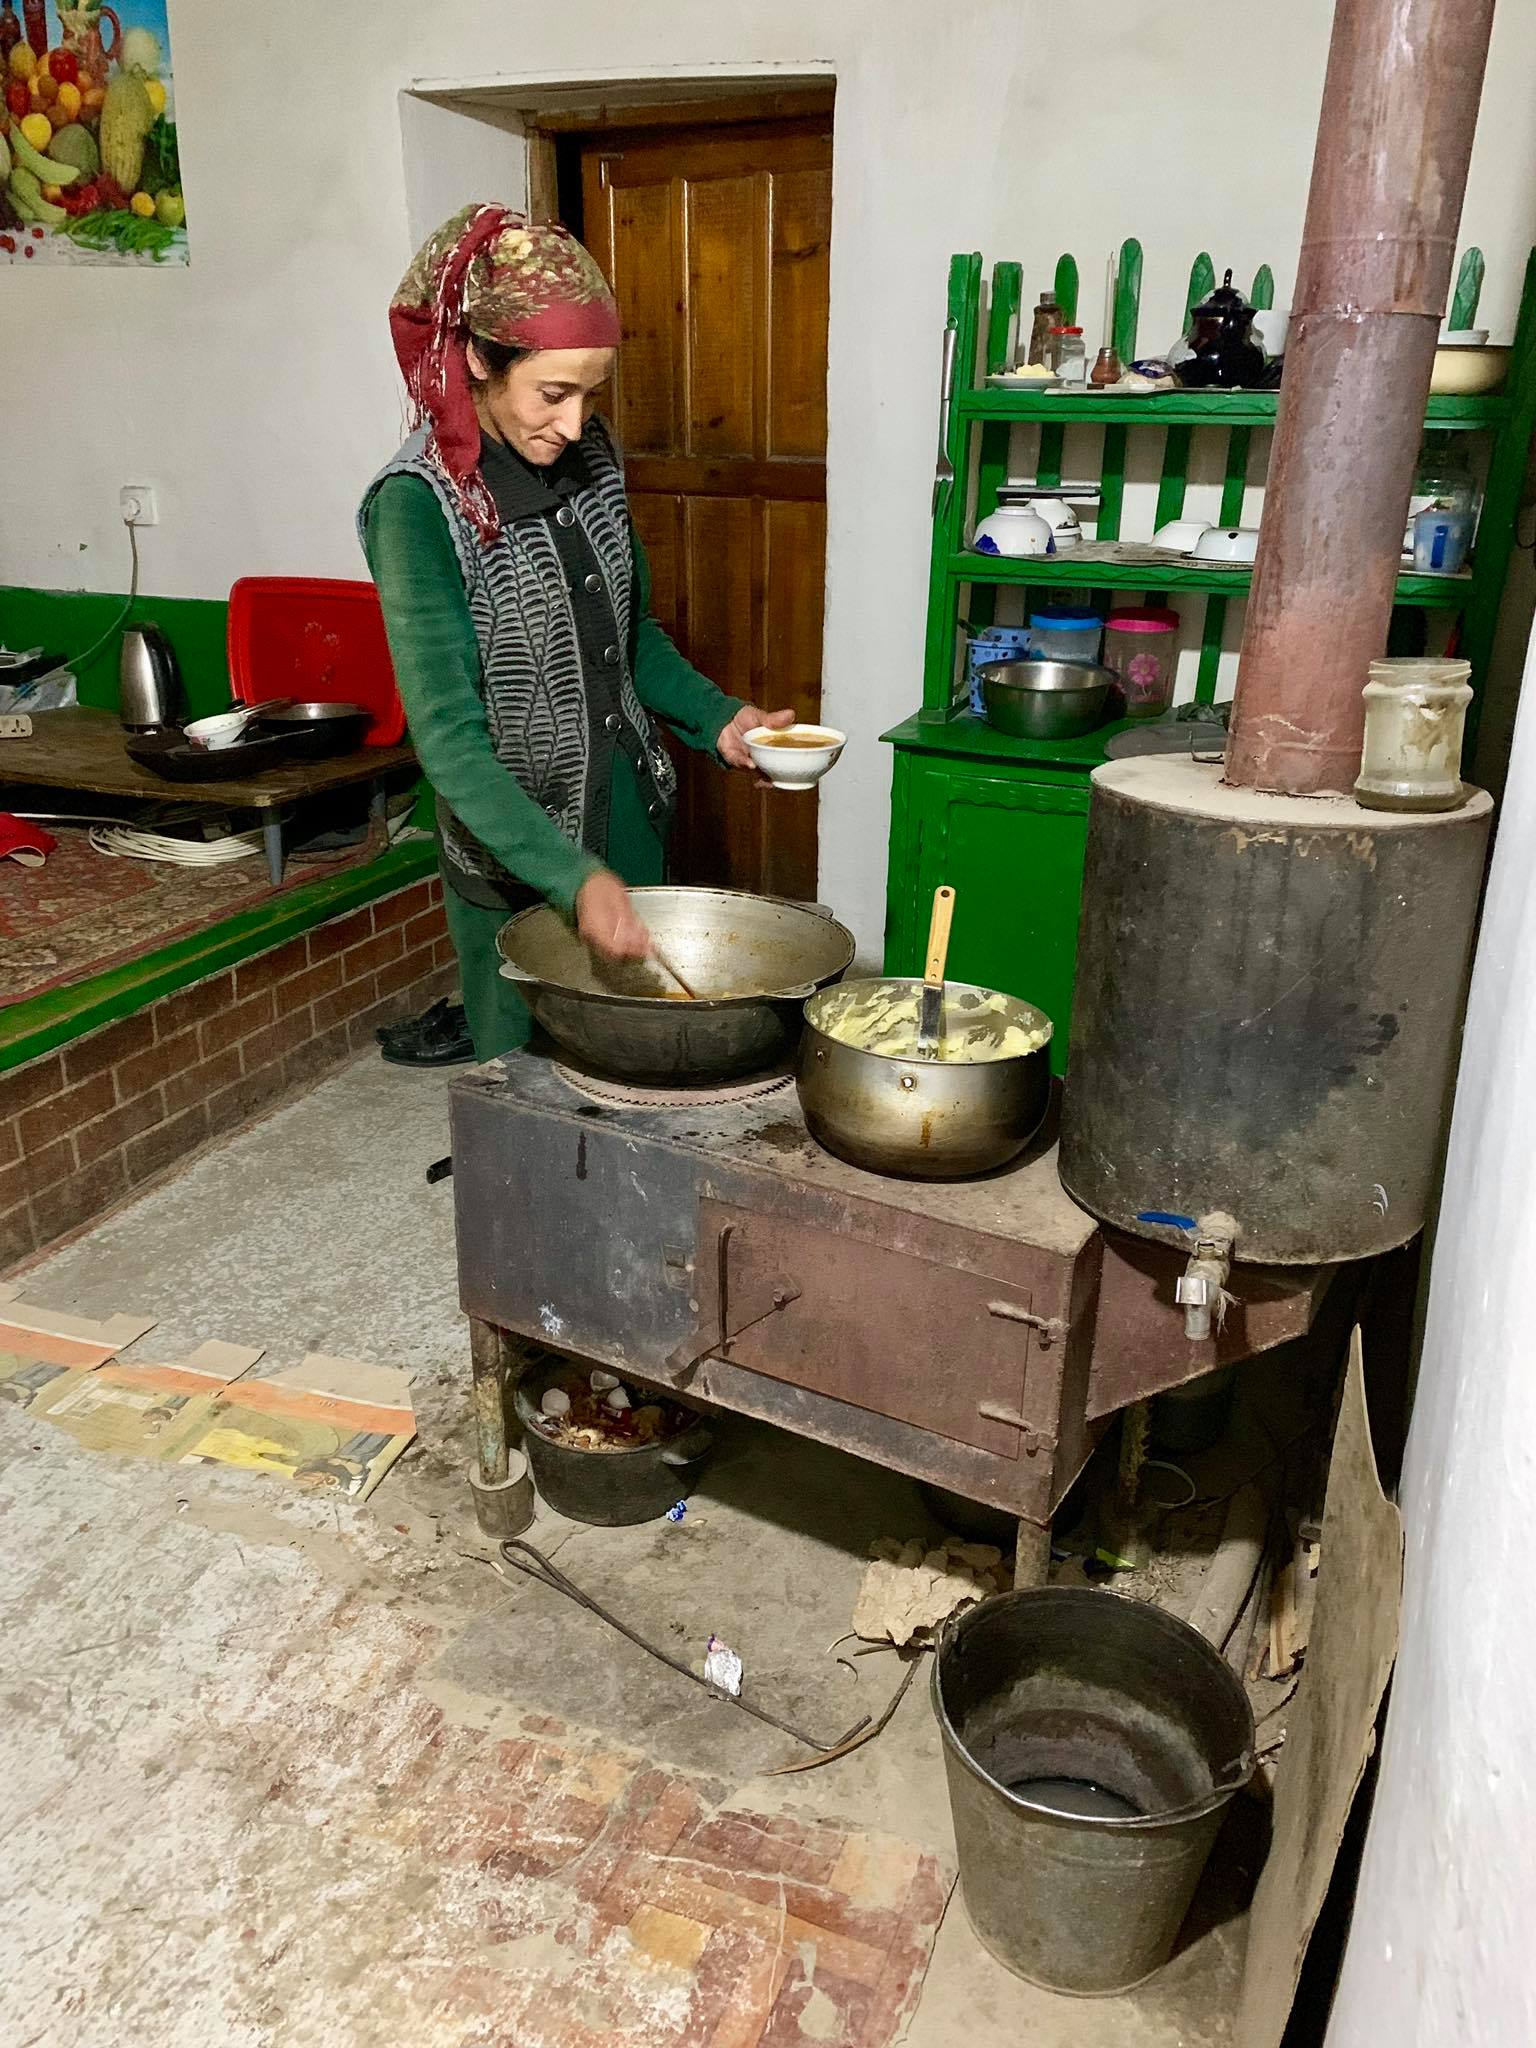 Kach Solo Travels in 2019 Experiencing a Traditional Wakhan Wedding in Tajikistan15.jpg